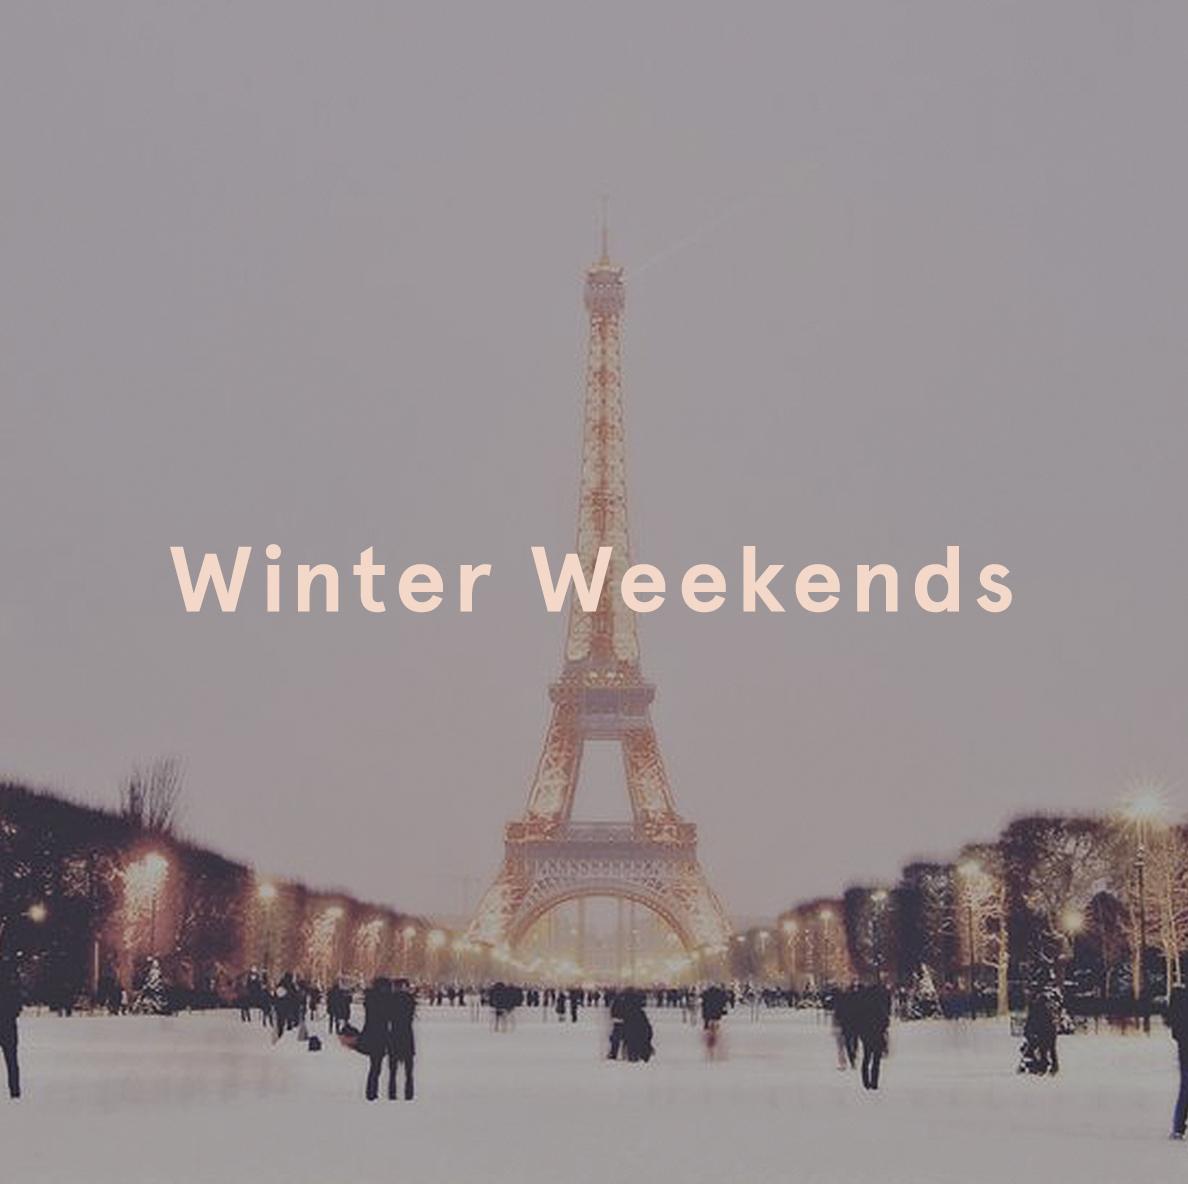 Winter Breaks Ego European Weekends Paris Eiffel Tower